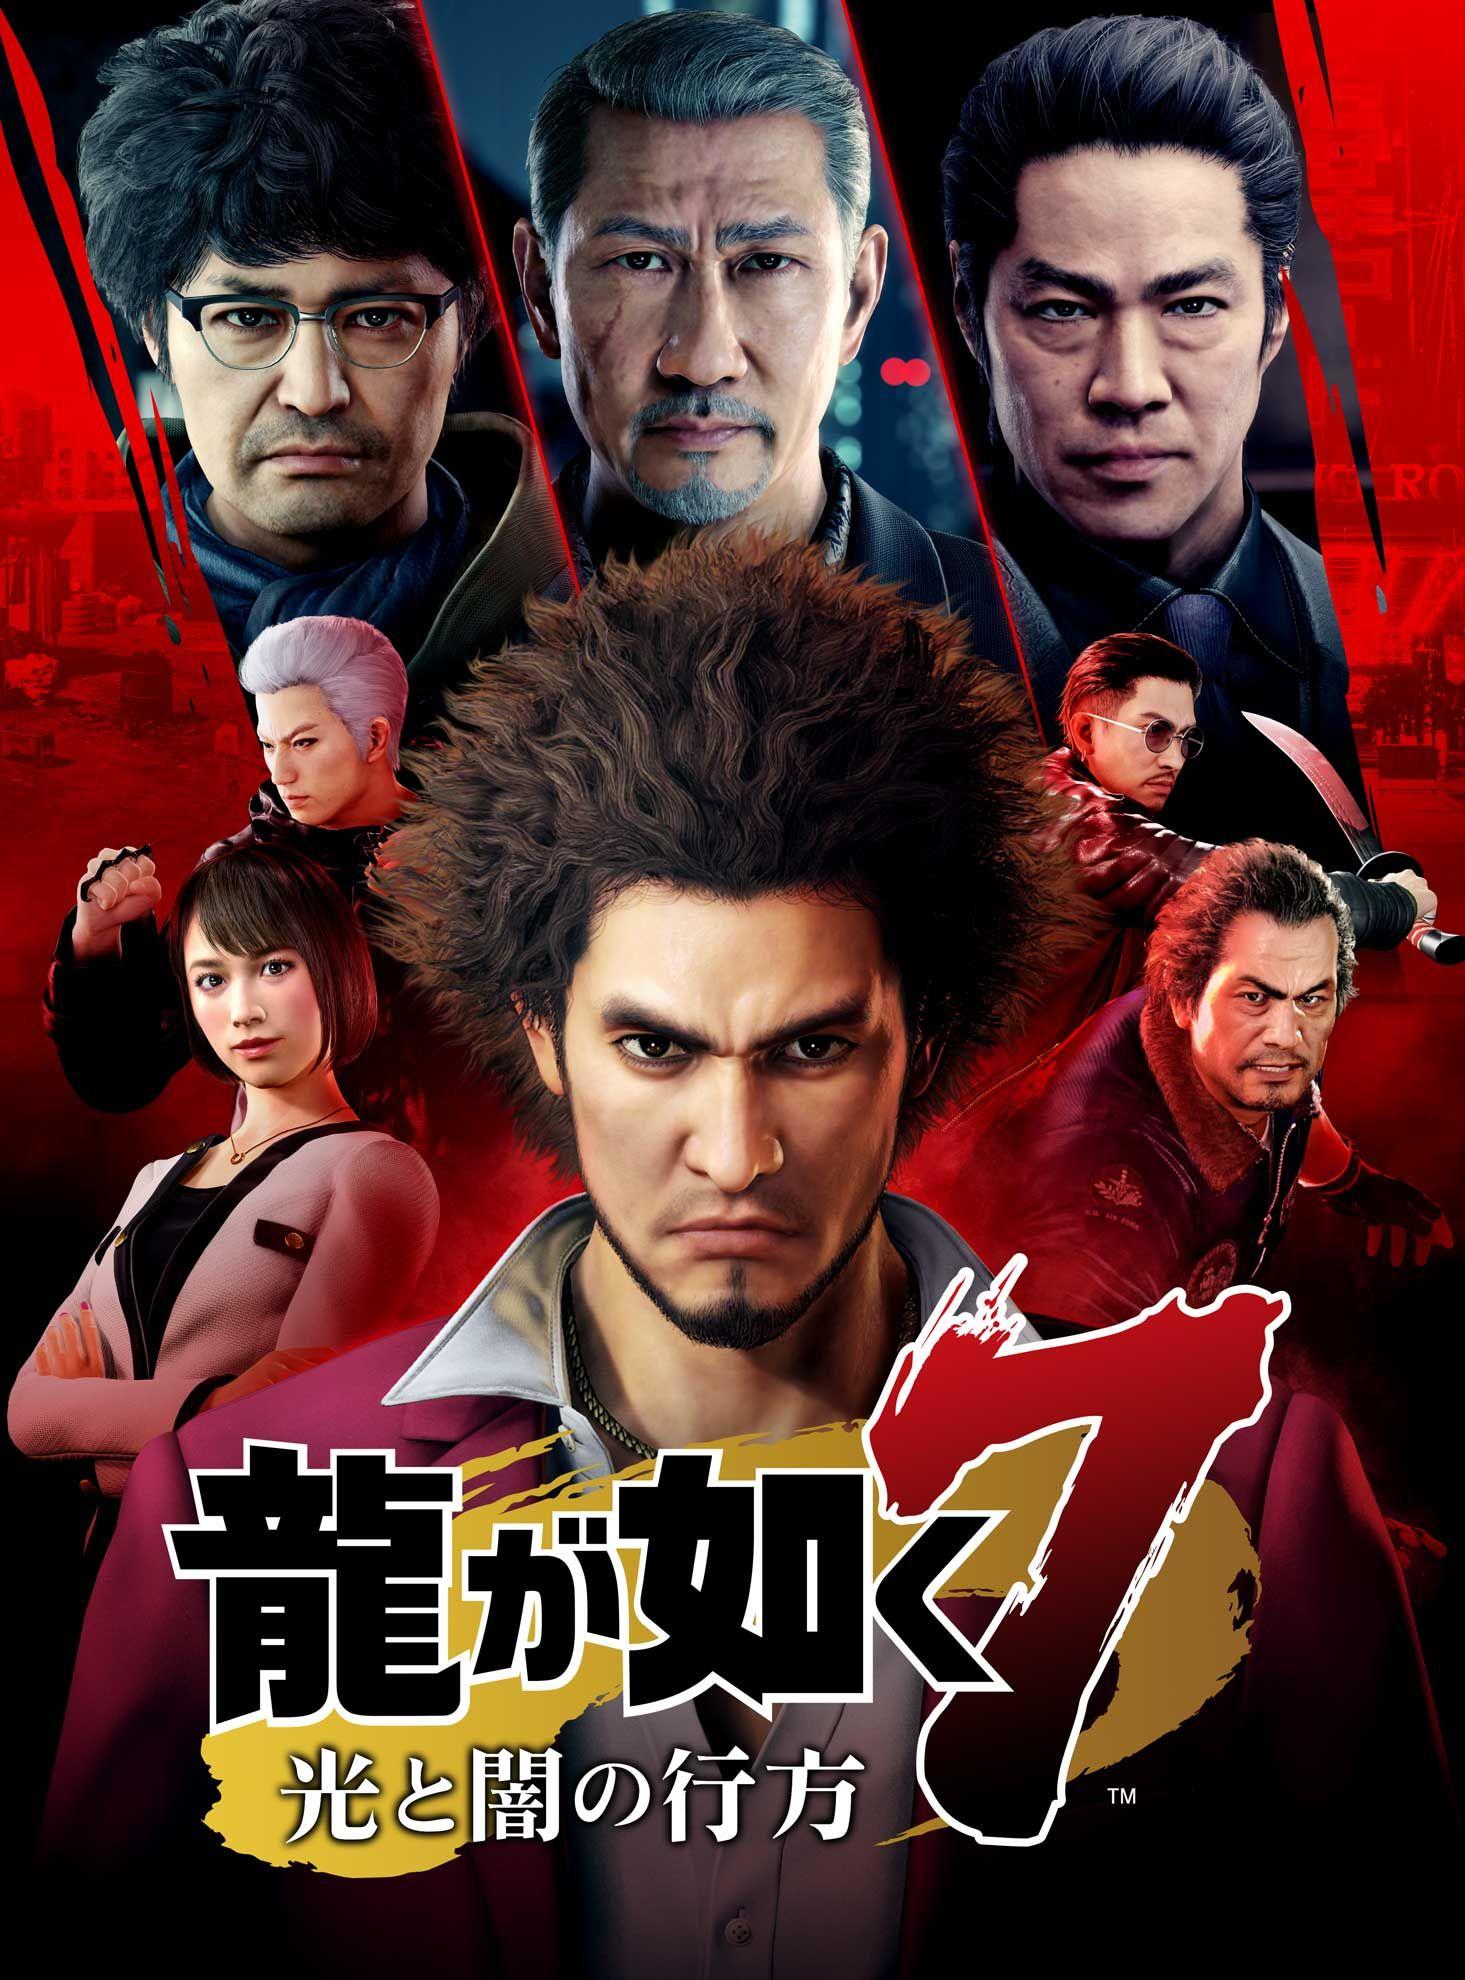 Japanese Box Art, New Gameplay for Yakuza Like a Dragon